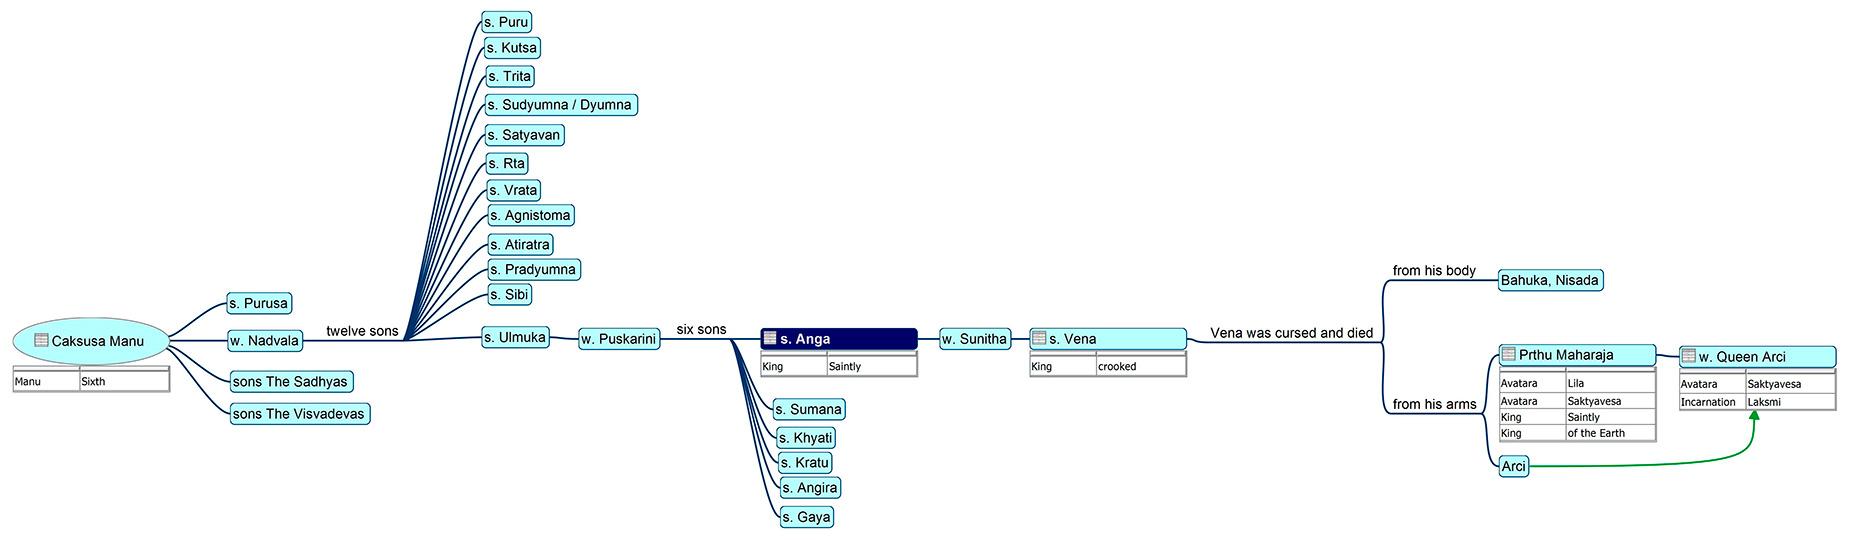 Family tree of King Anga